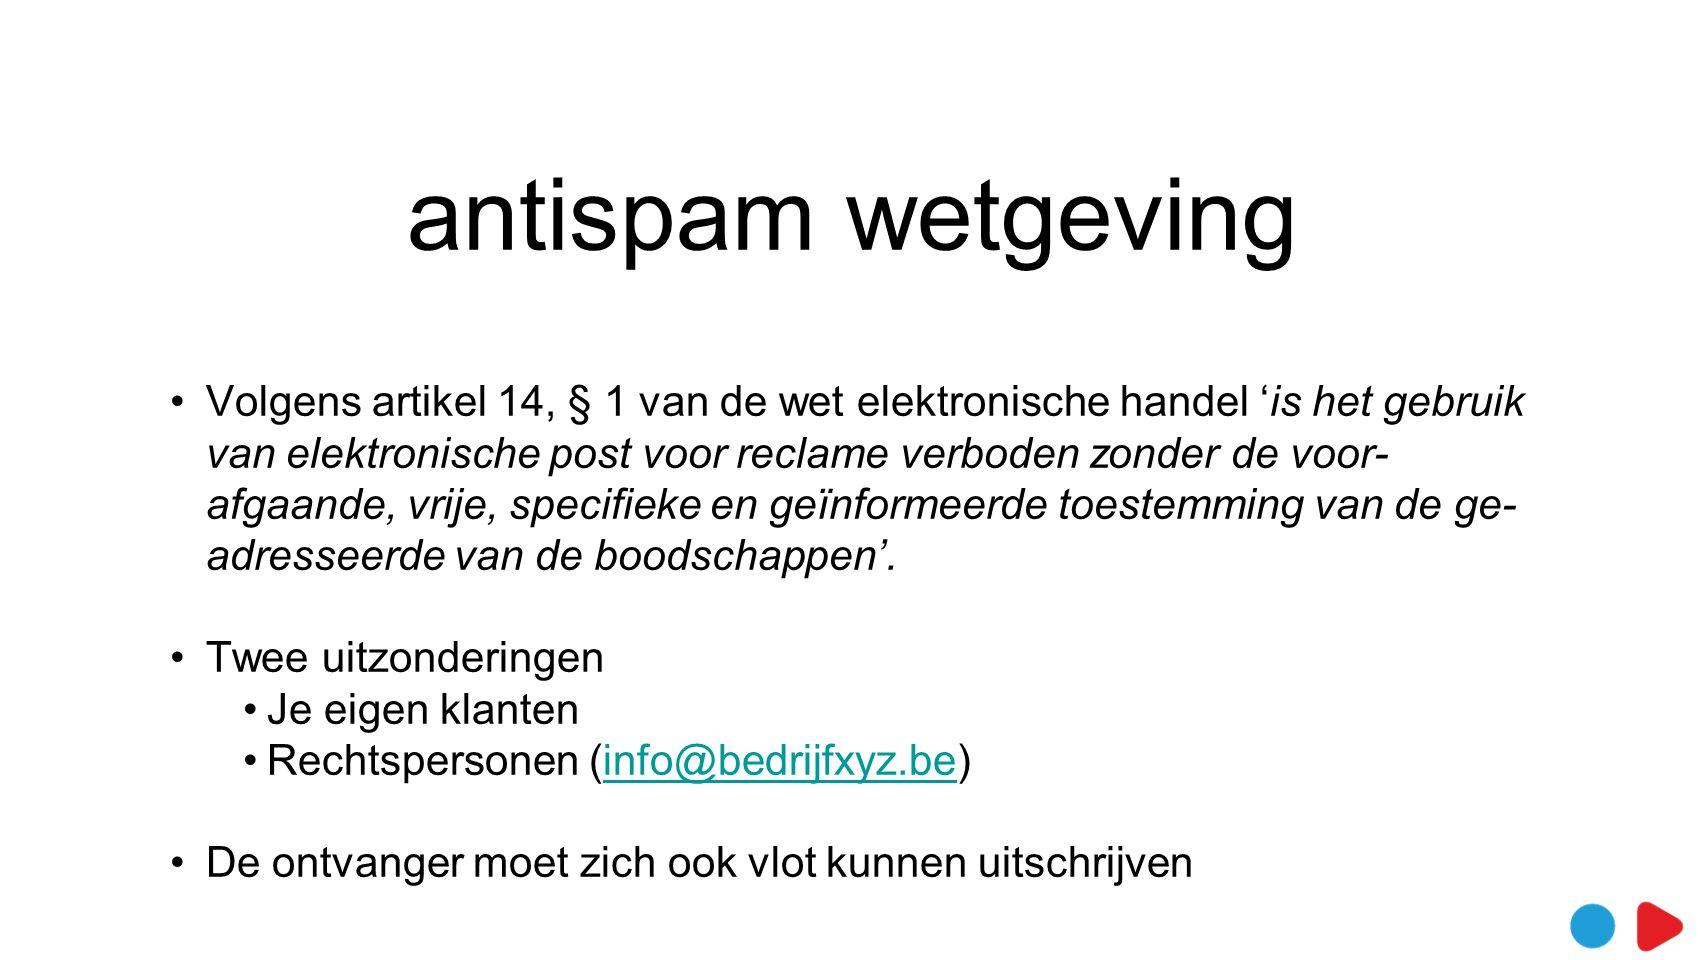 antispam wetgeving